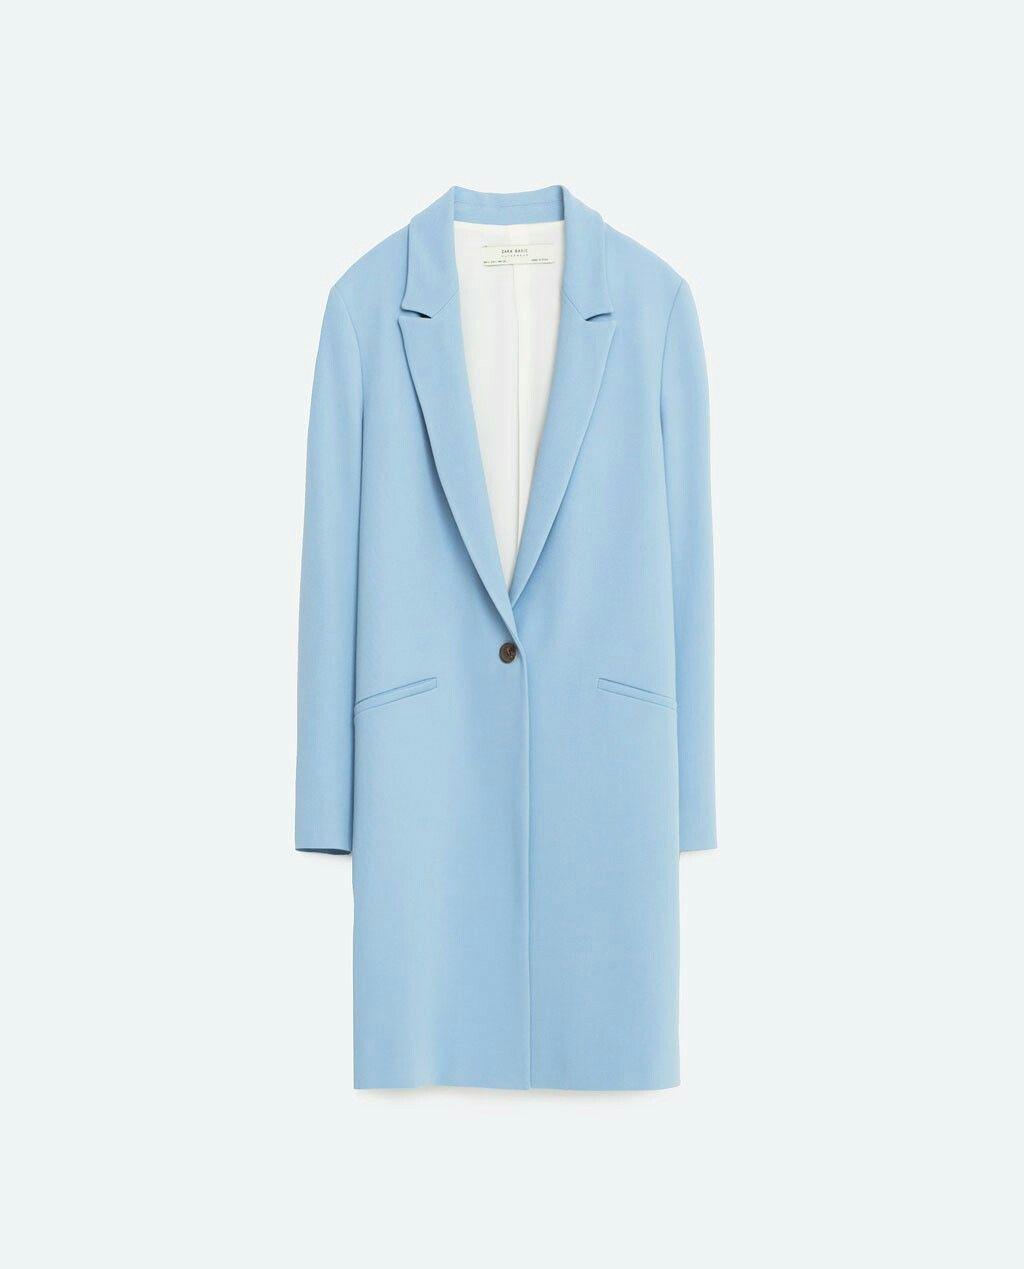 Manteau femme bleu ciel zara